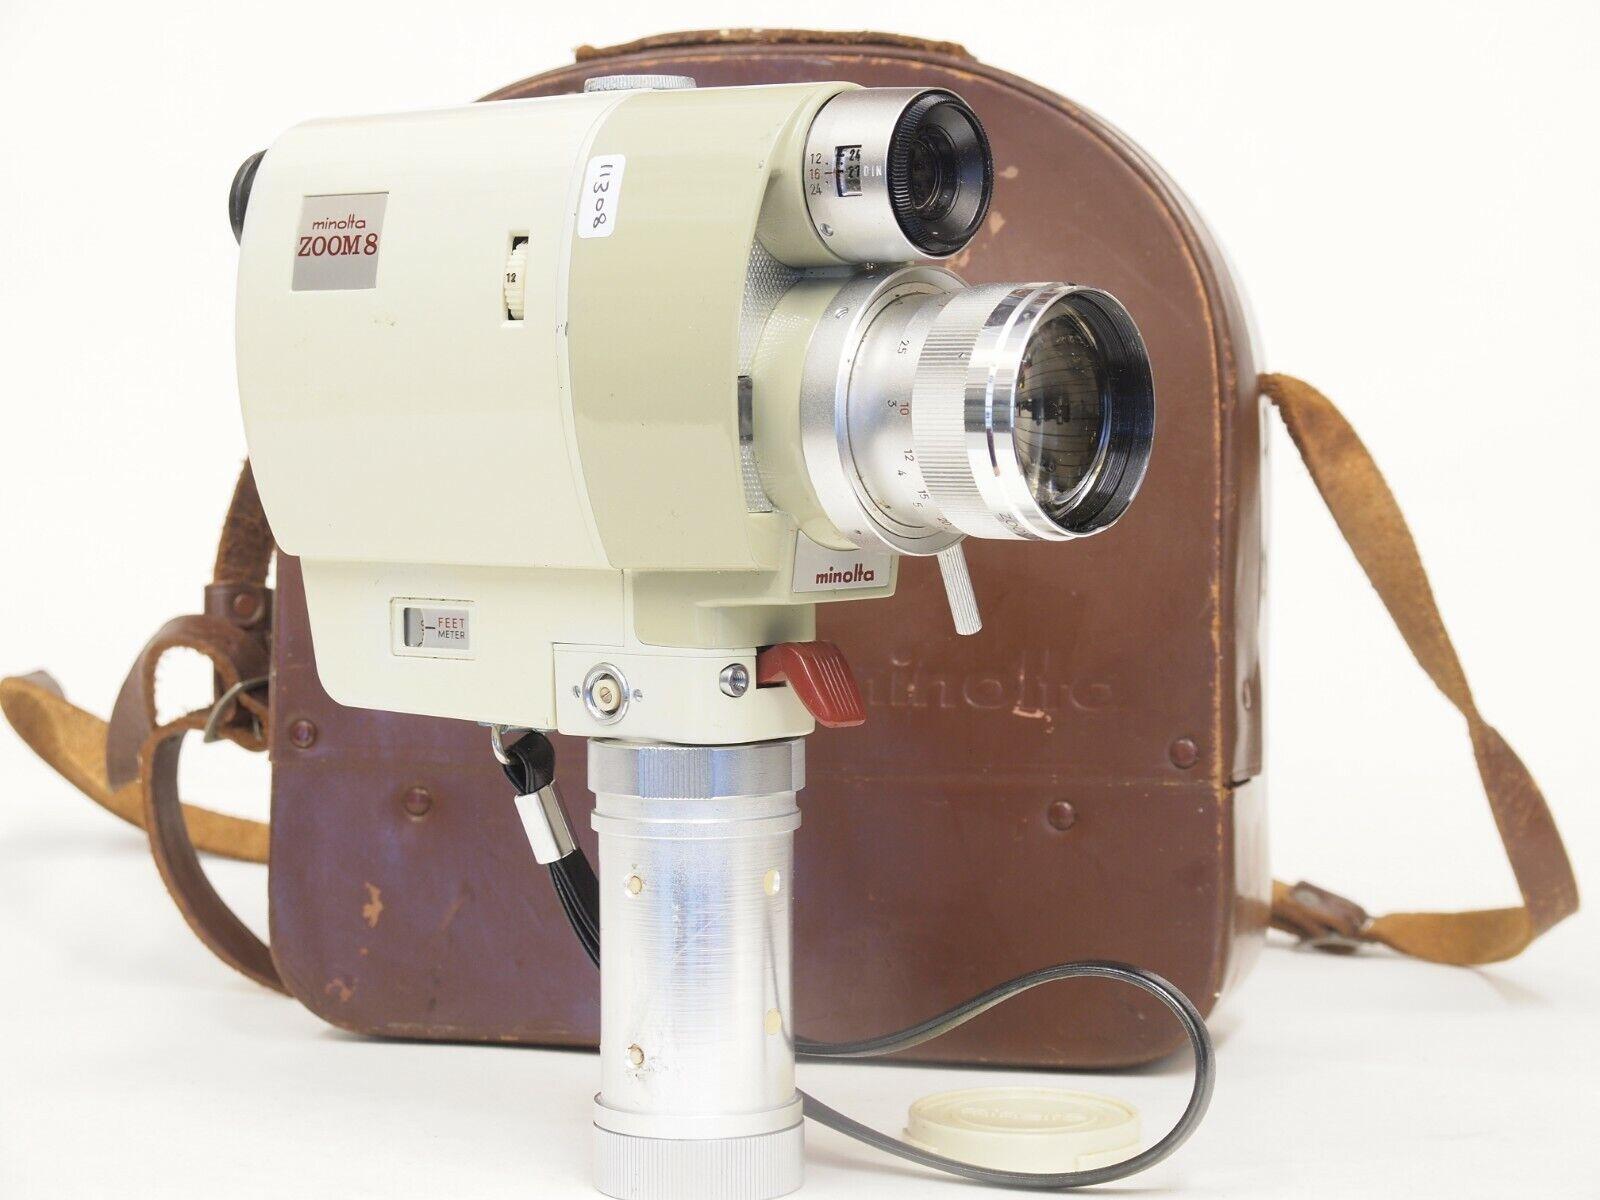 Minolta Zoom 8 Cine/Movie Camera with Leather Case. Stock No u11308